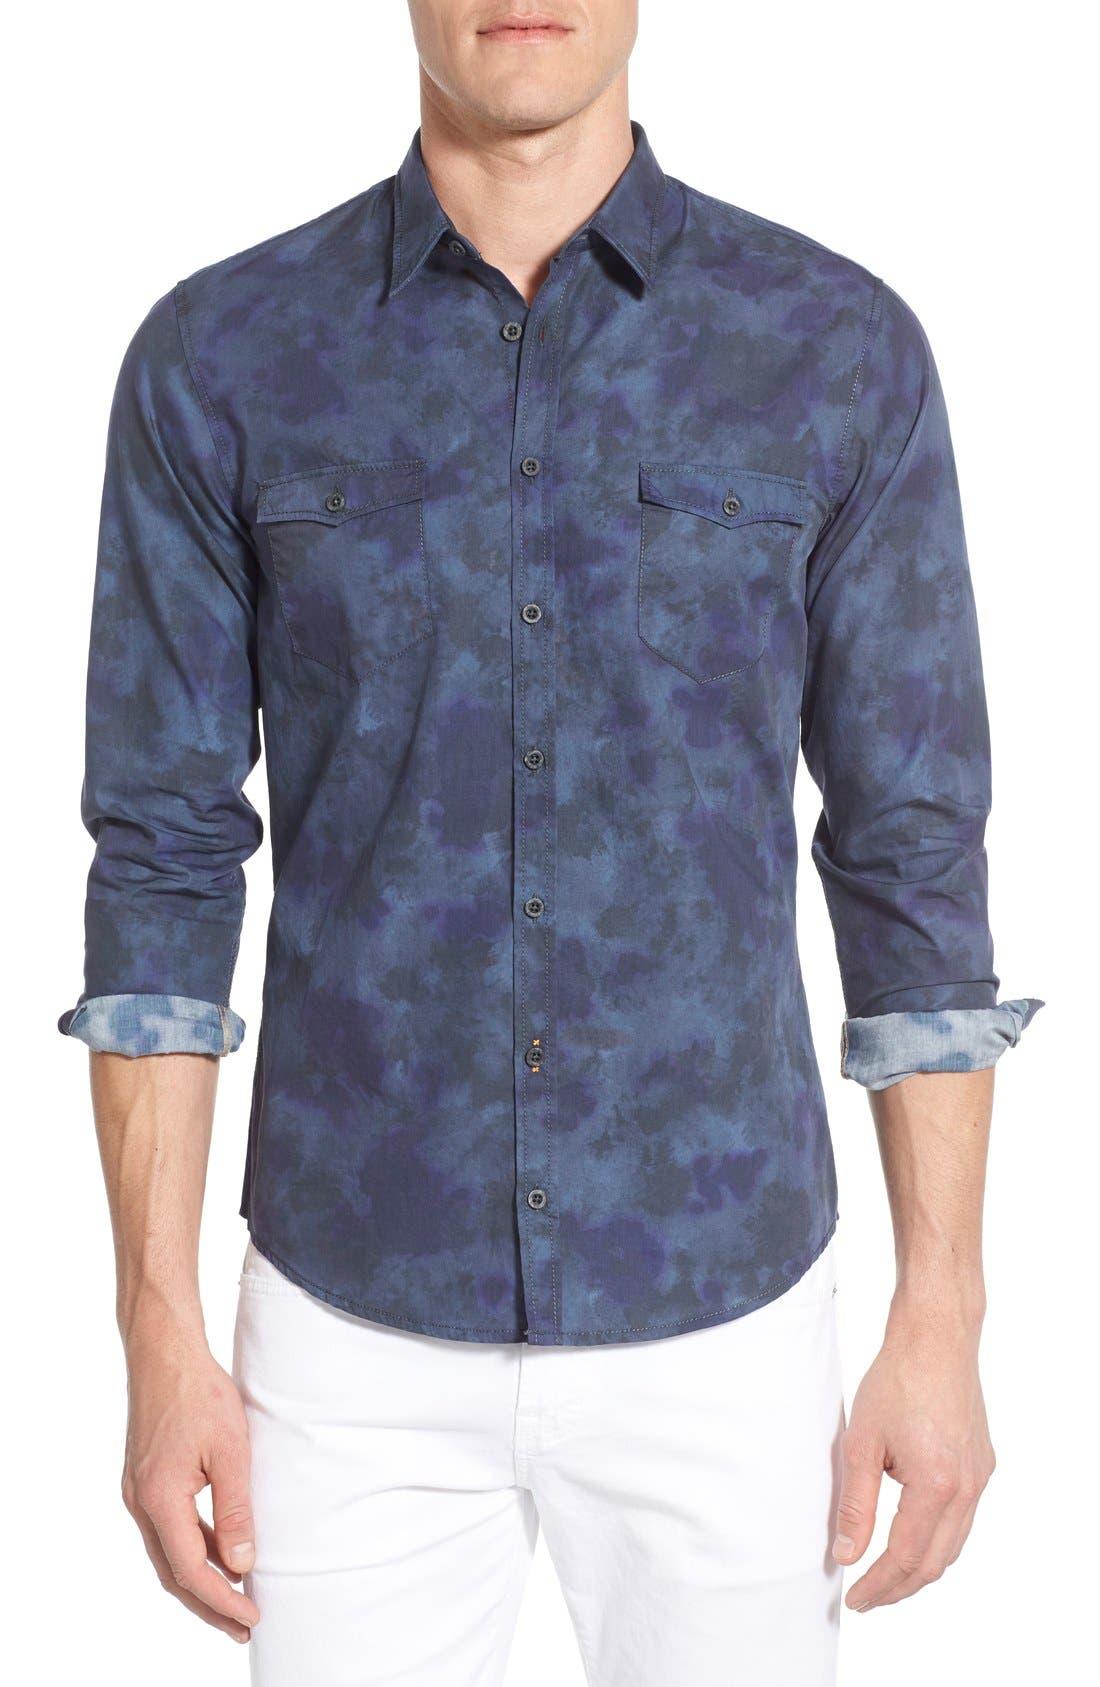 Edoslime Extra Trim Fit Print Woven Shirt,                             Main thumbnail 1, color,                             Dark Blue